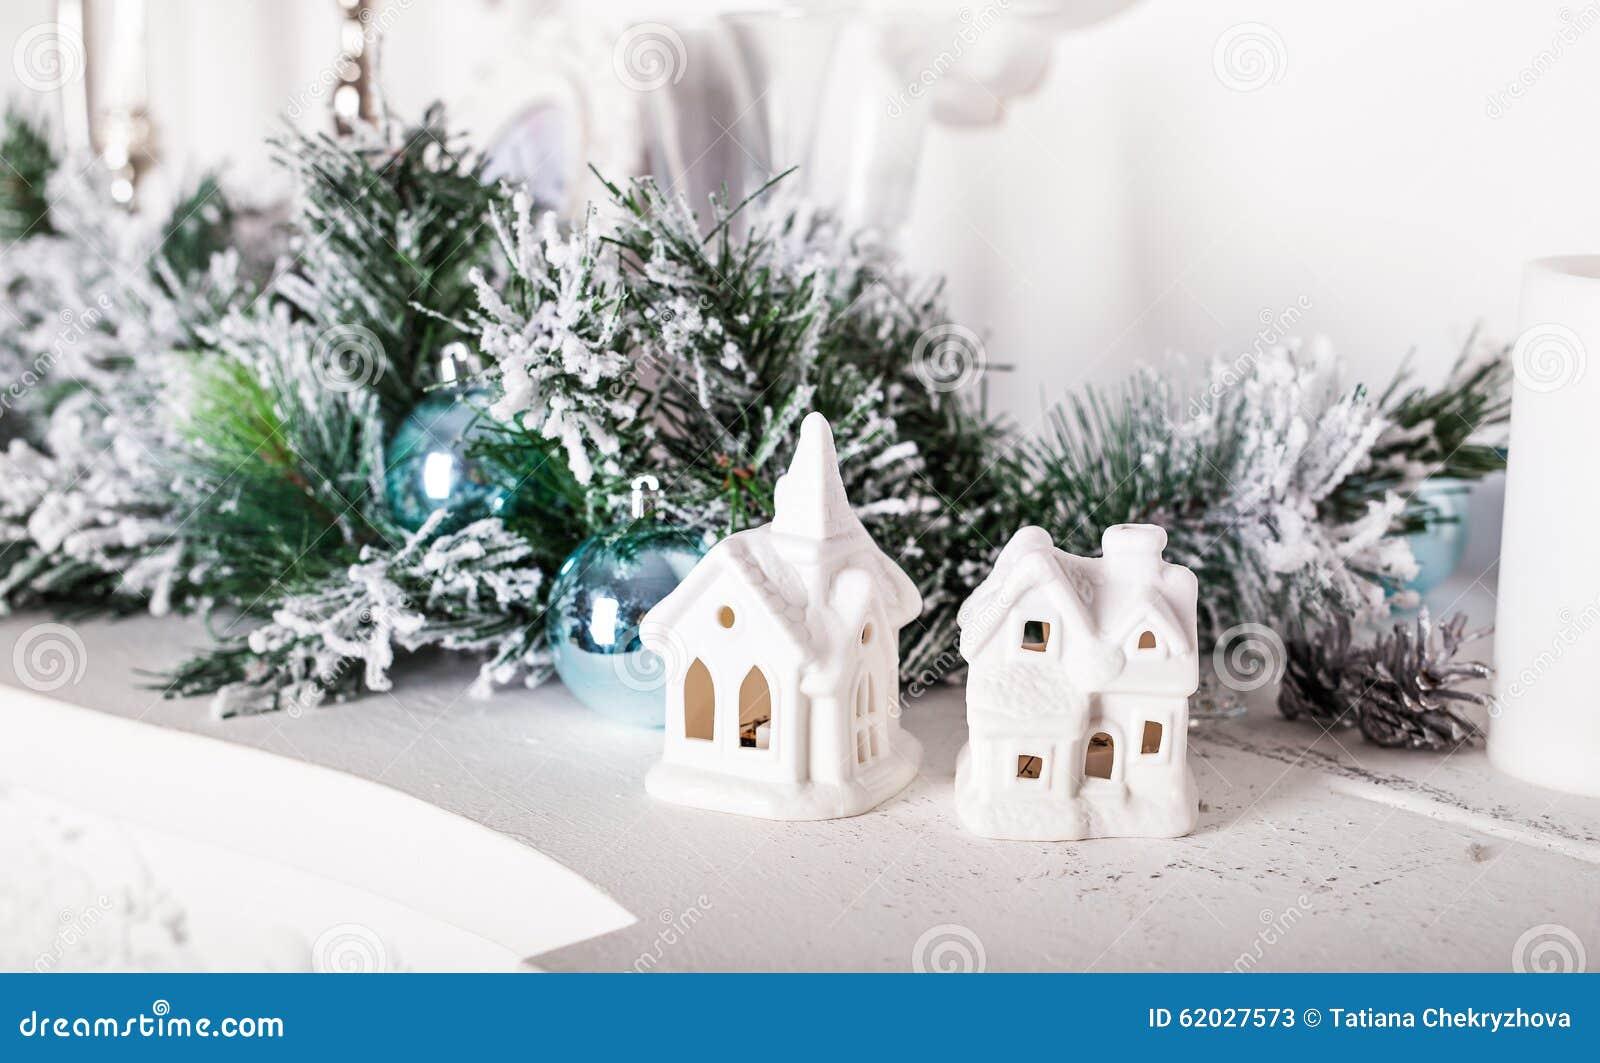 Decorazioni di natale case bianche immagine stock immagine di decorativo dicembre 62027573 - Decorazioni bianche ...